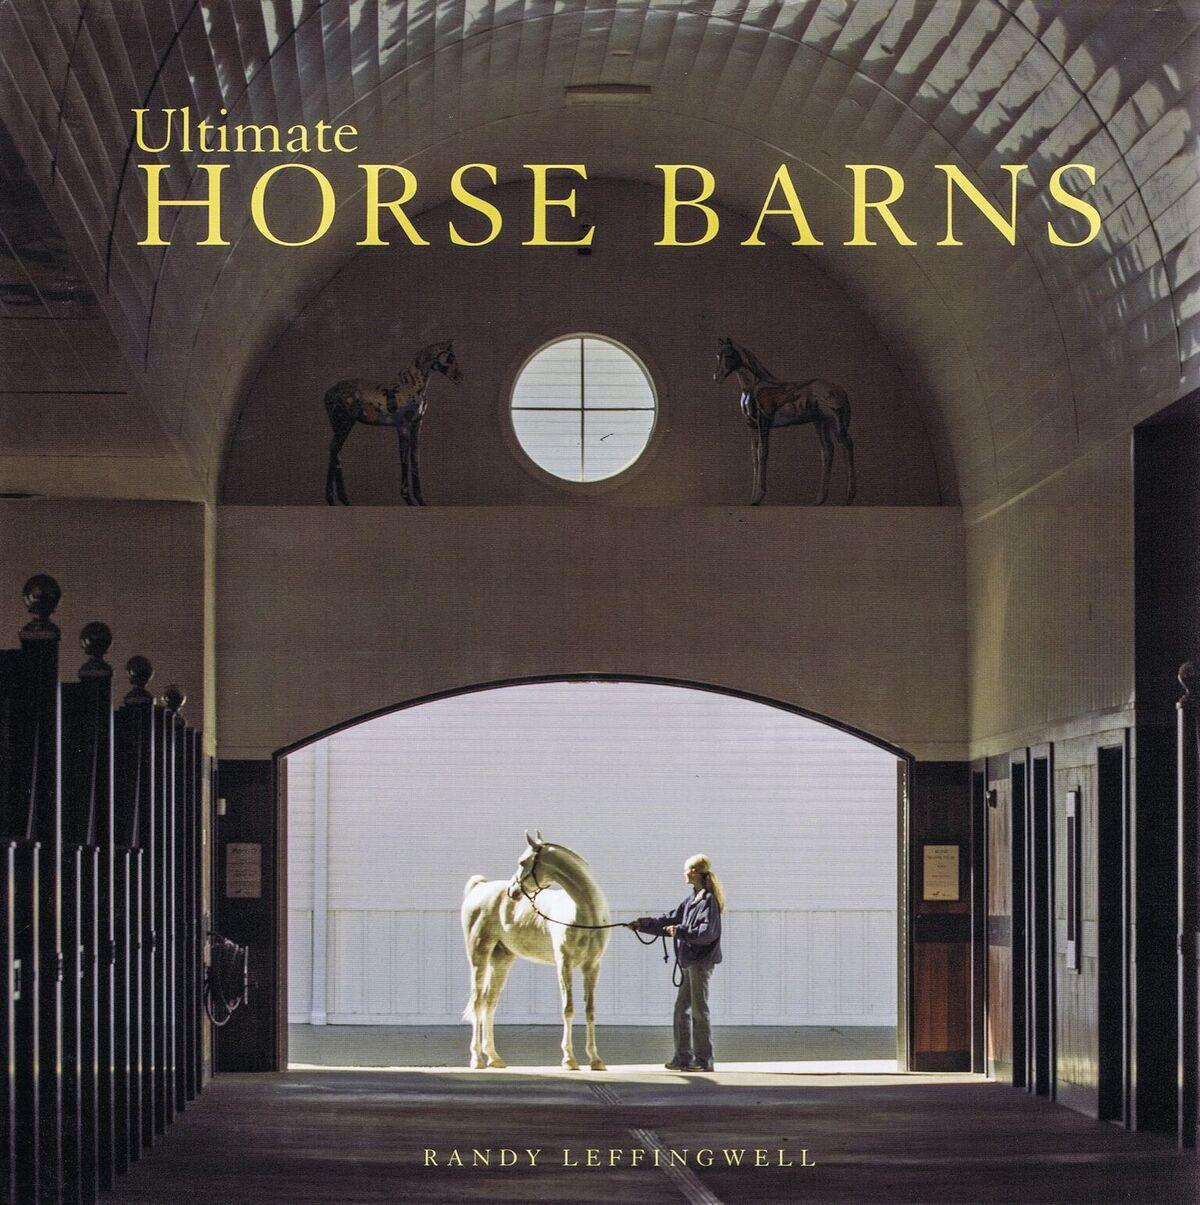 Ultimate Horse Barns cover.jpg